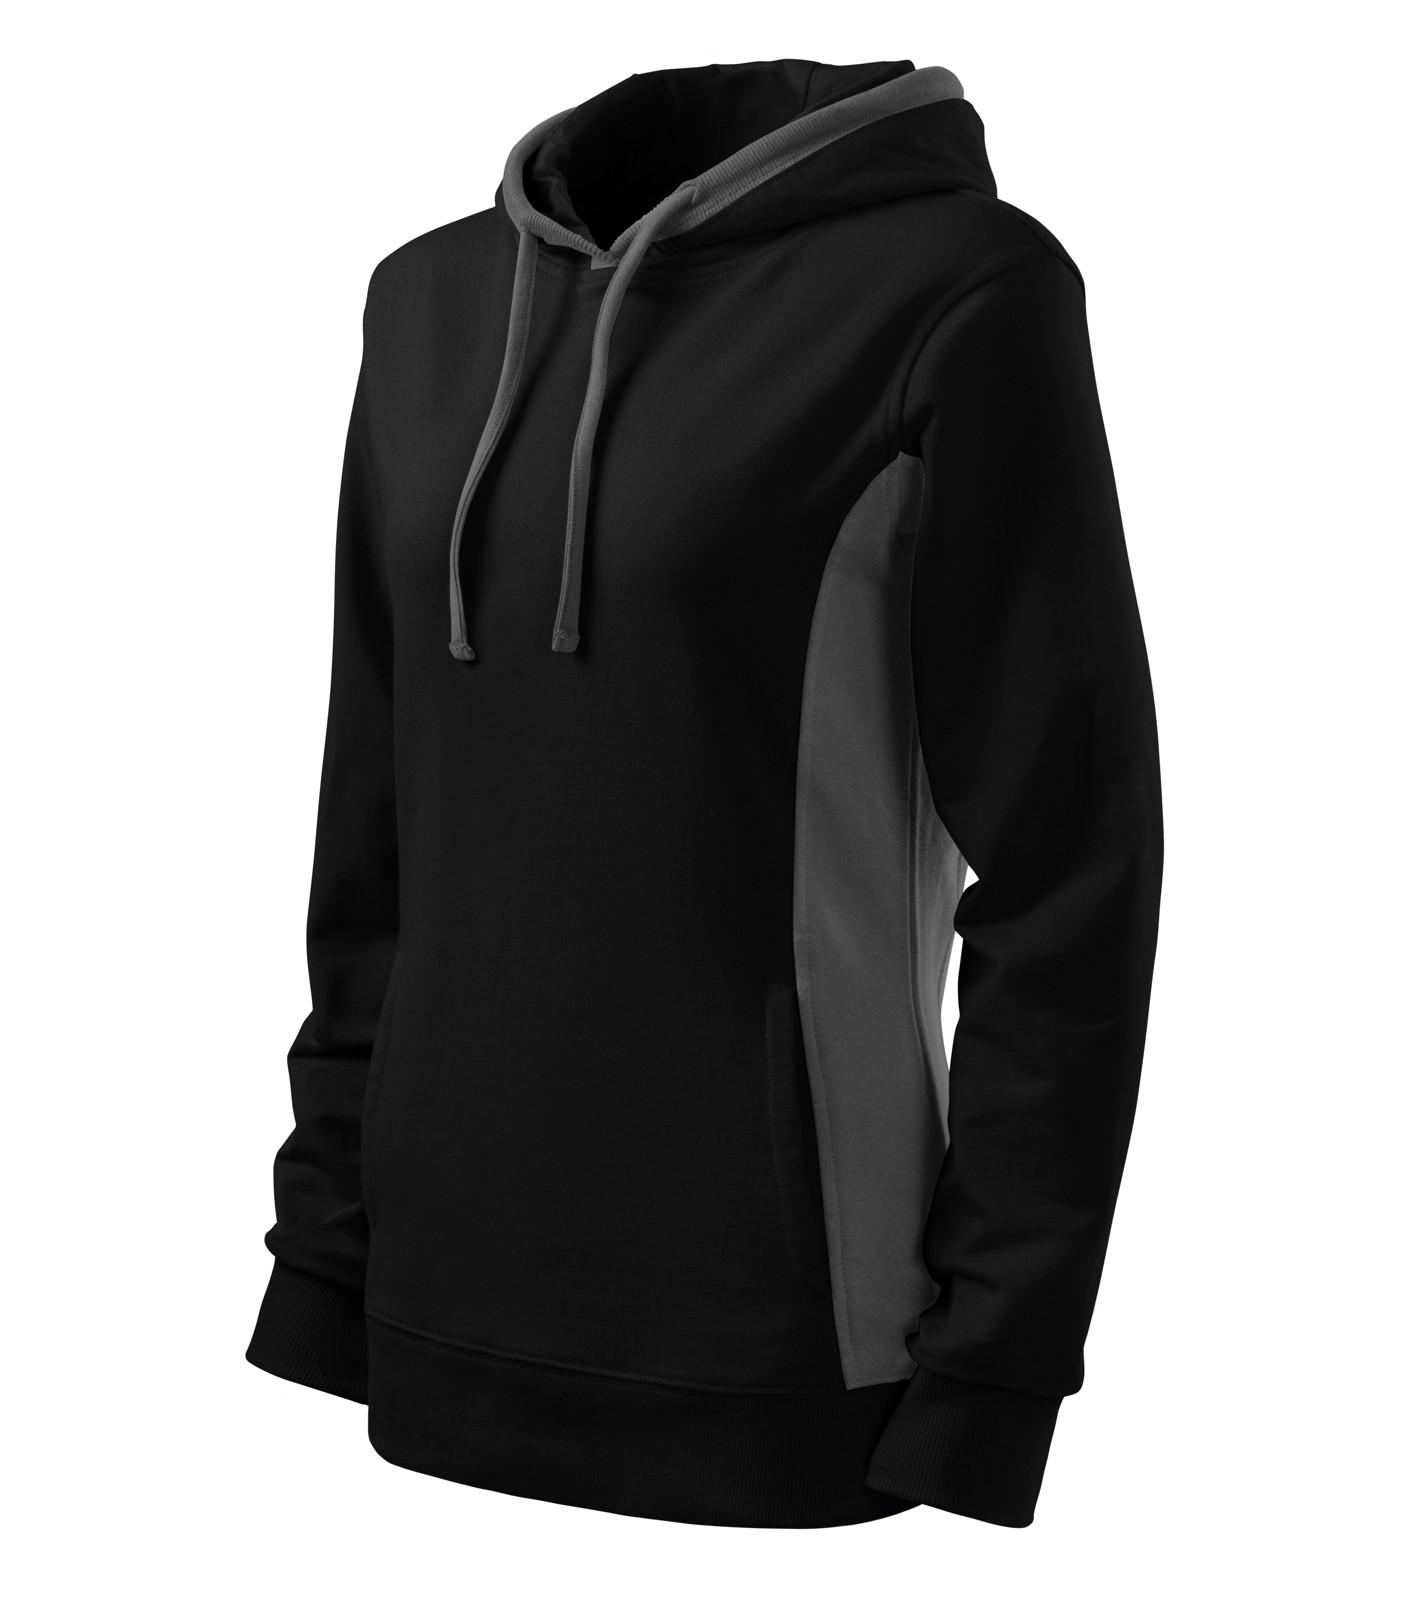 Sweatshirt women's Malfini Kangaroo - Black / L